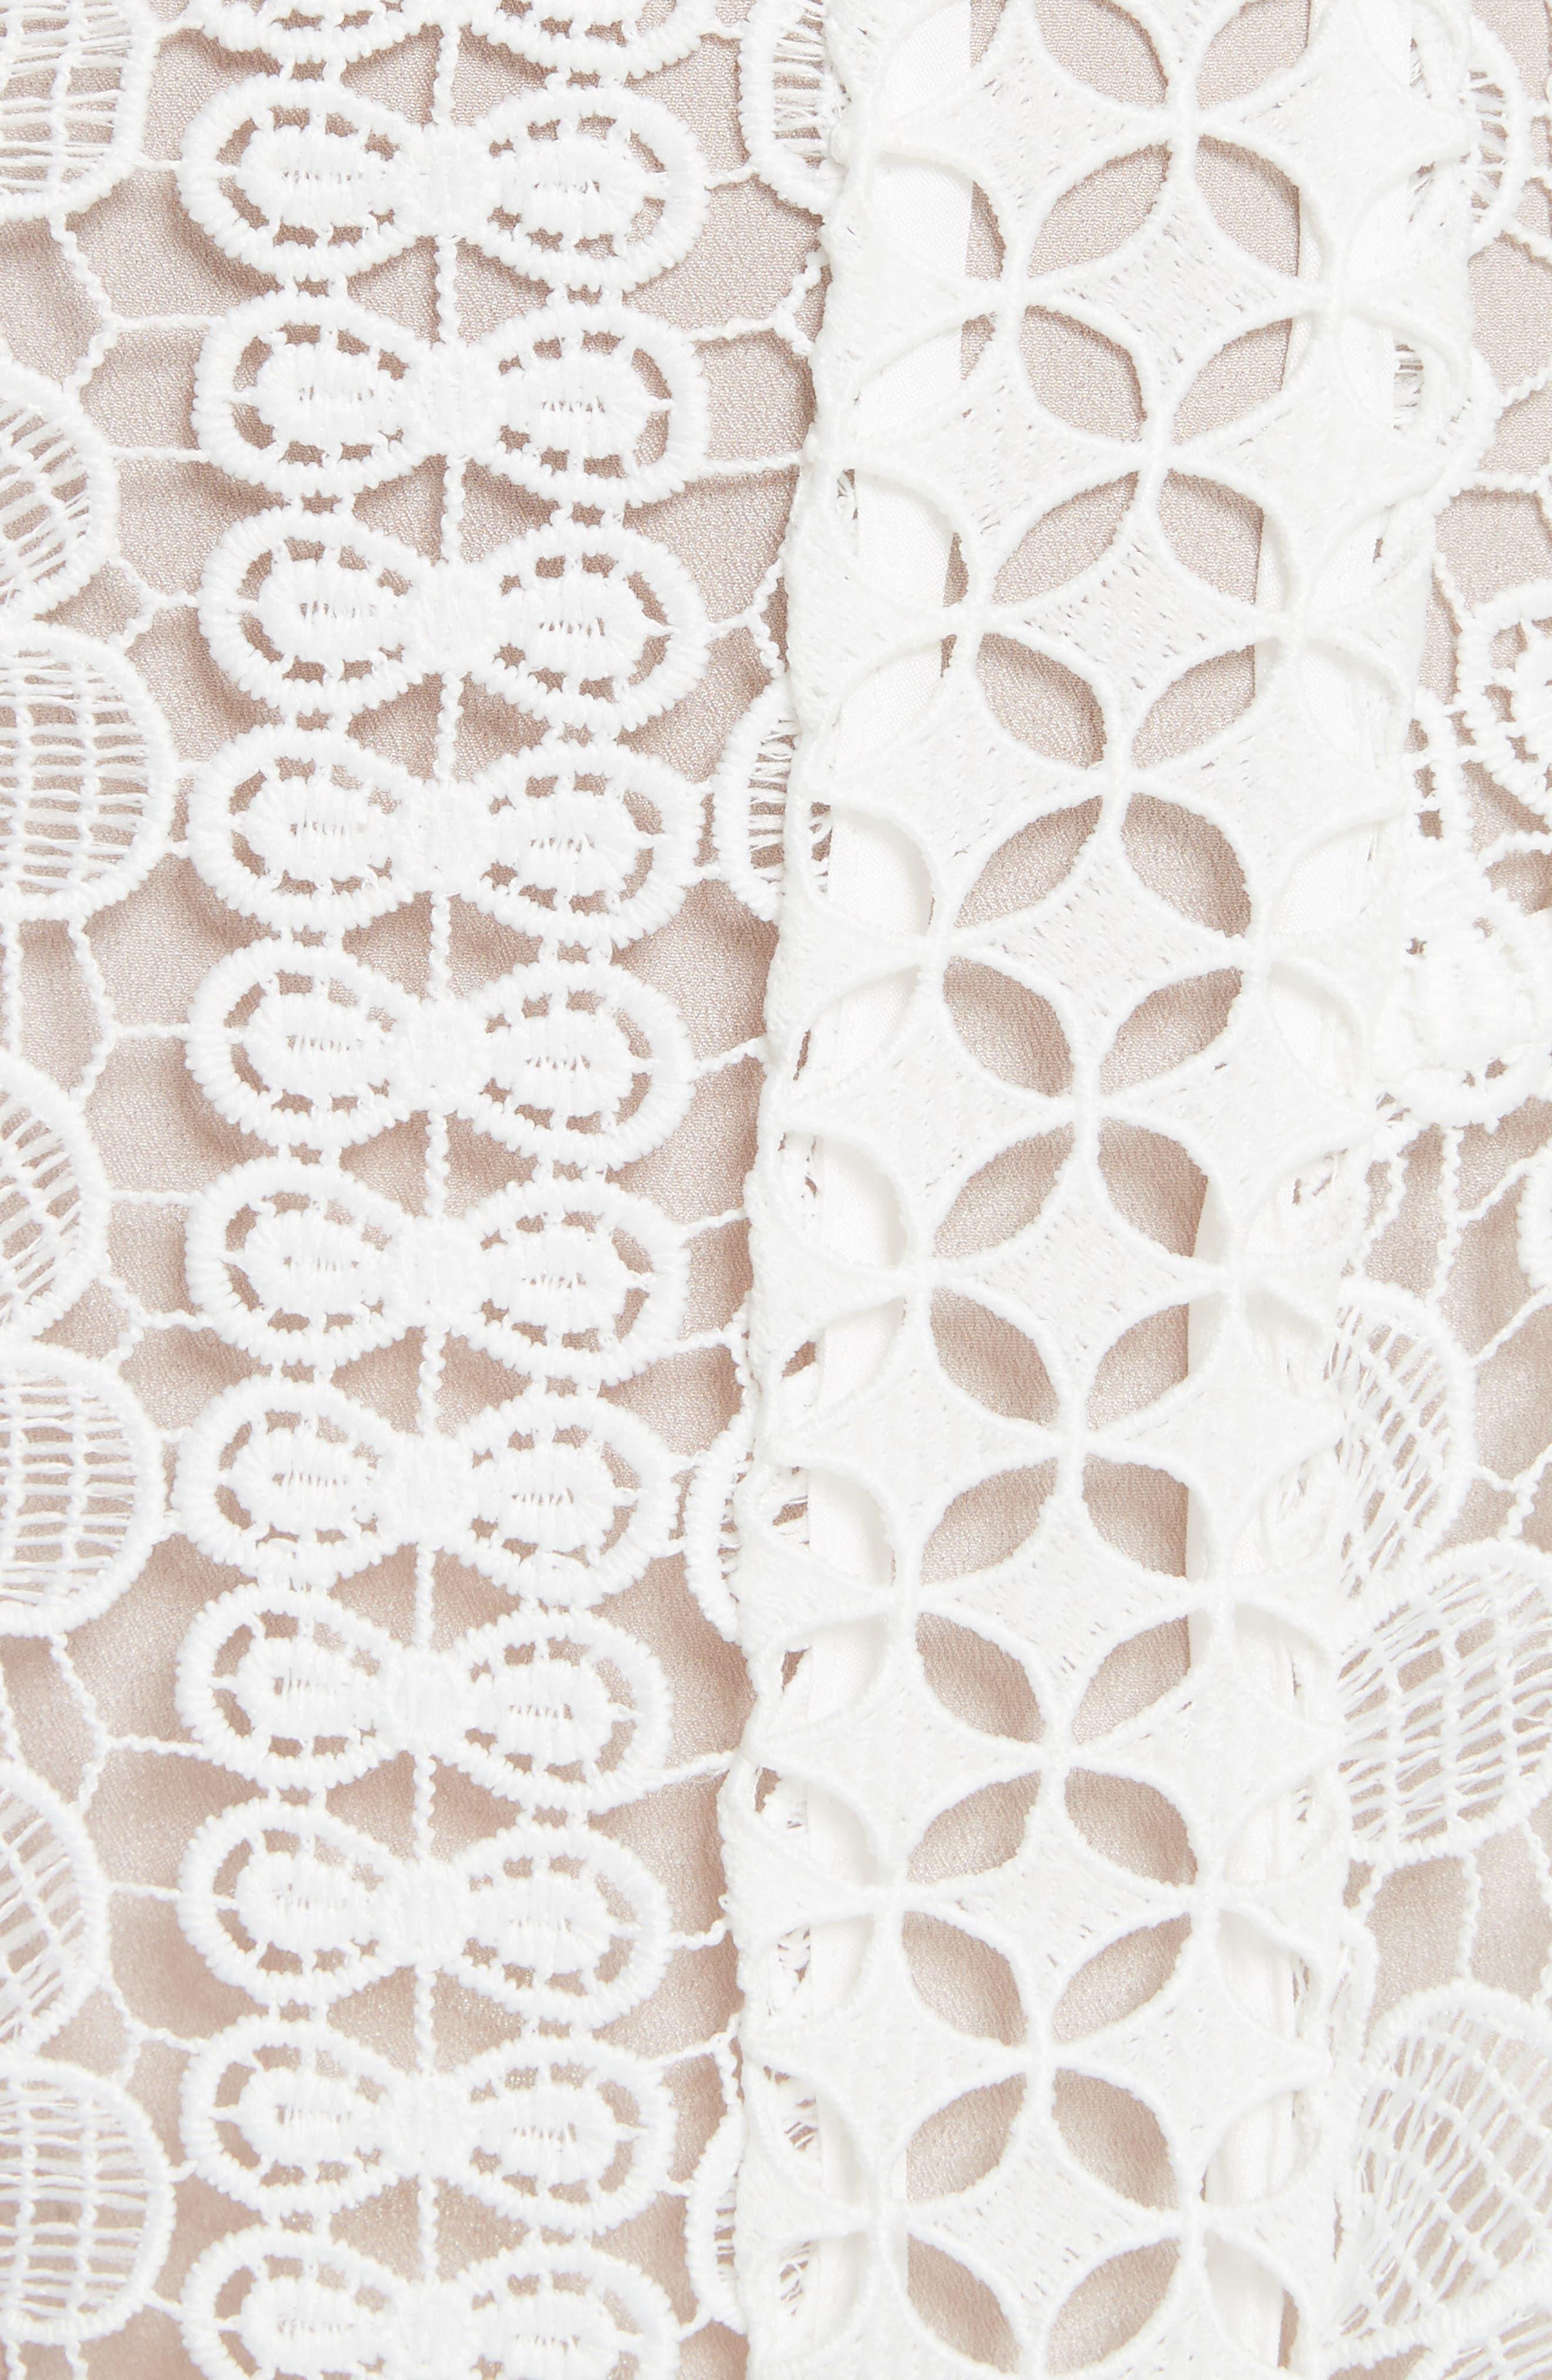 Floral Guipure Lace Midi Dress,                             Alternate thumbnail 5, color,                             White